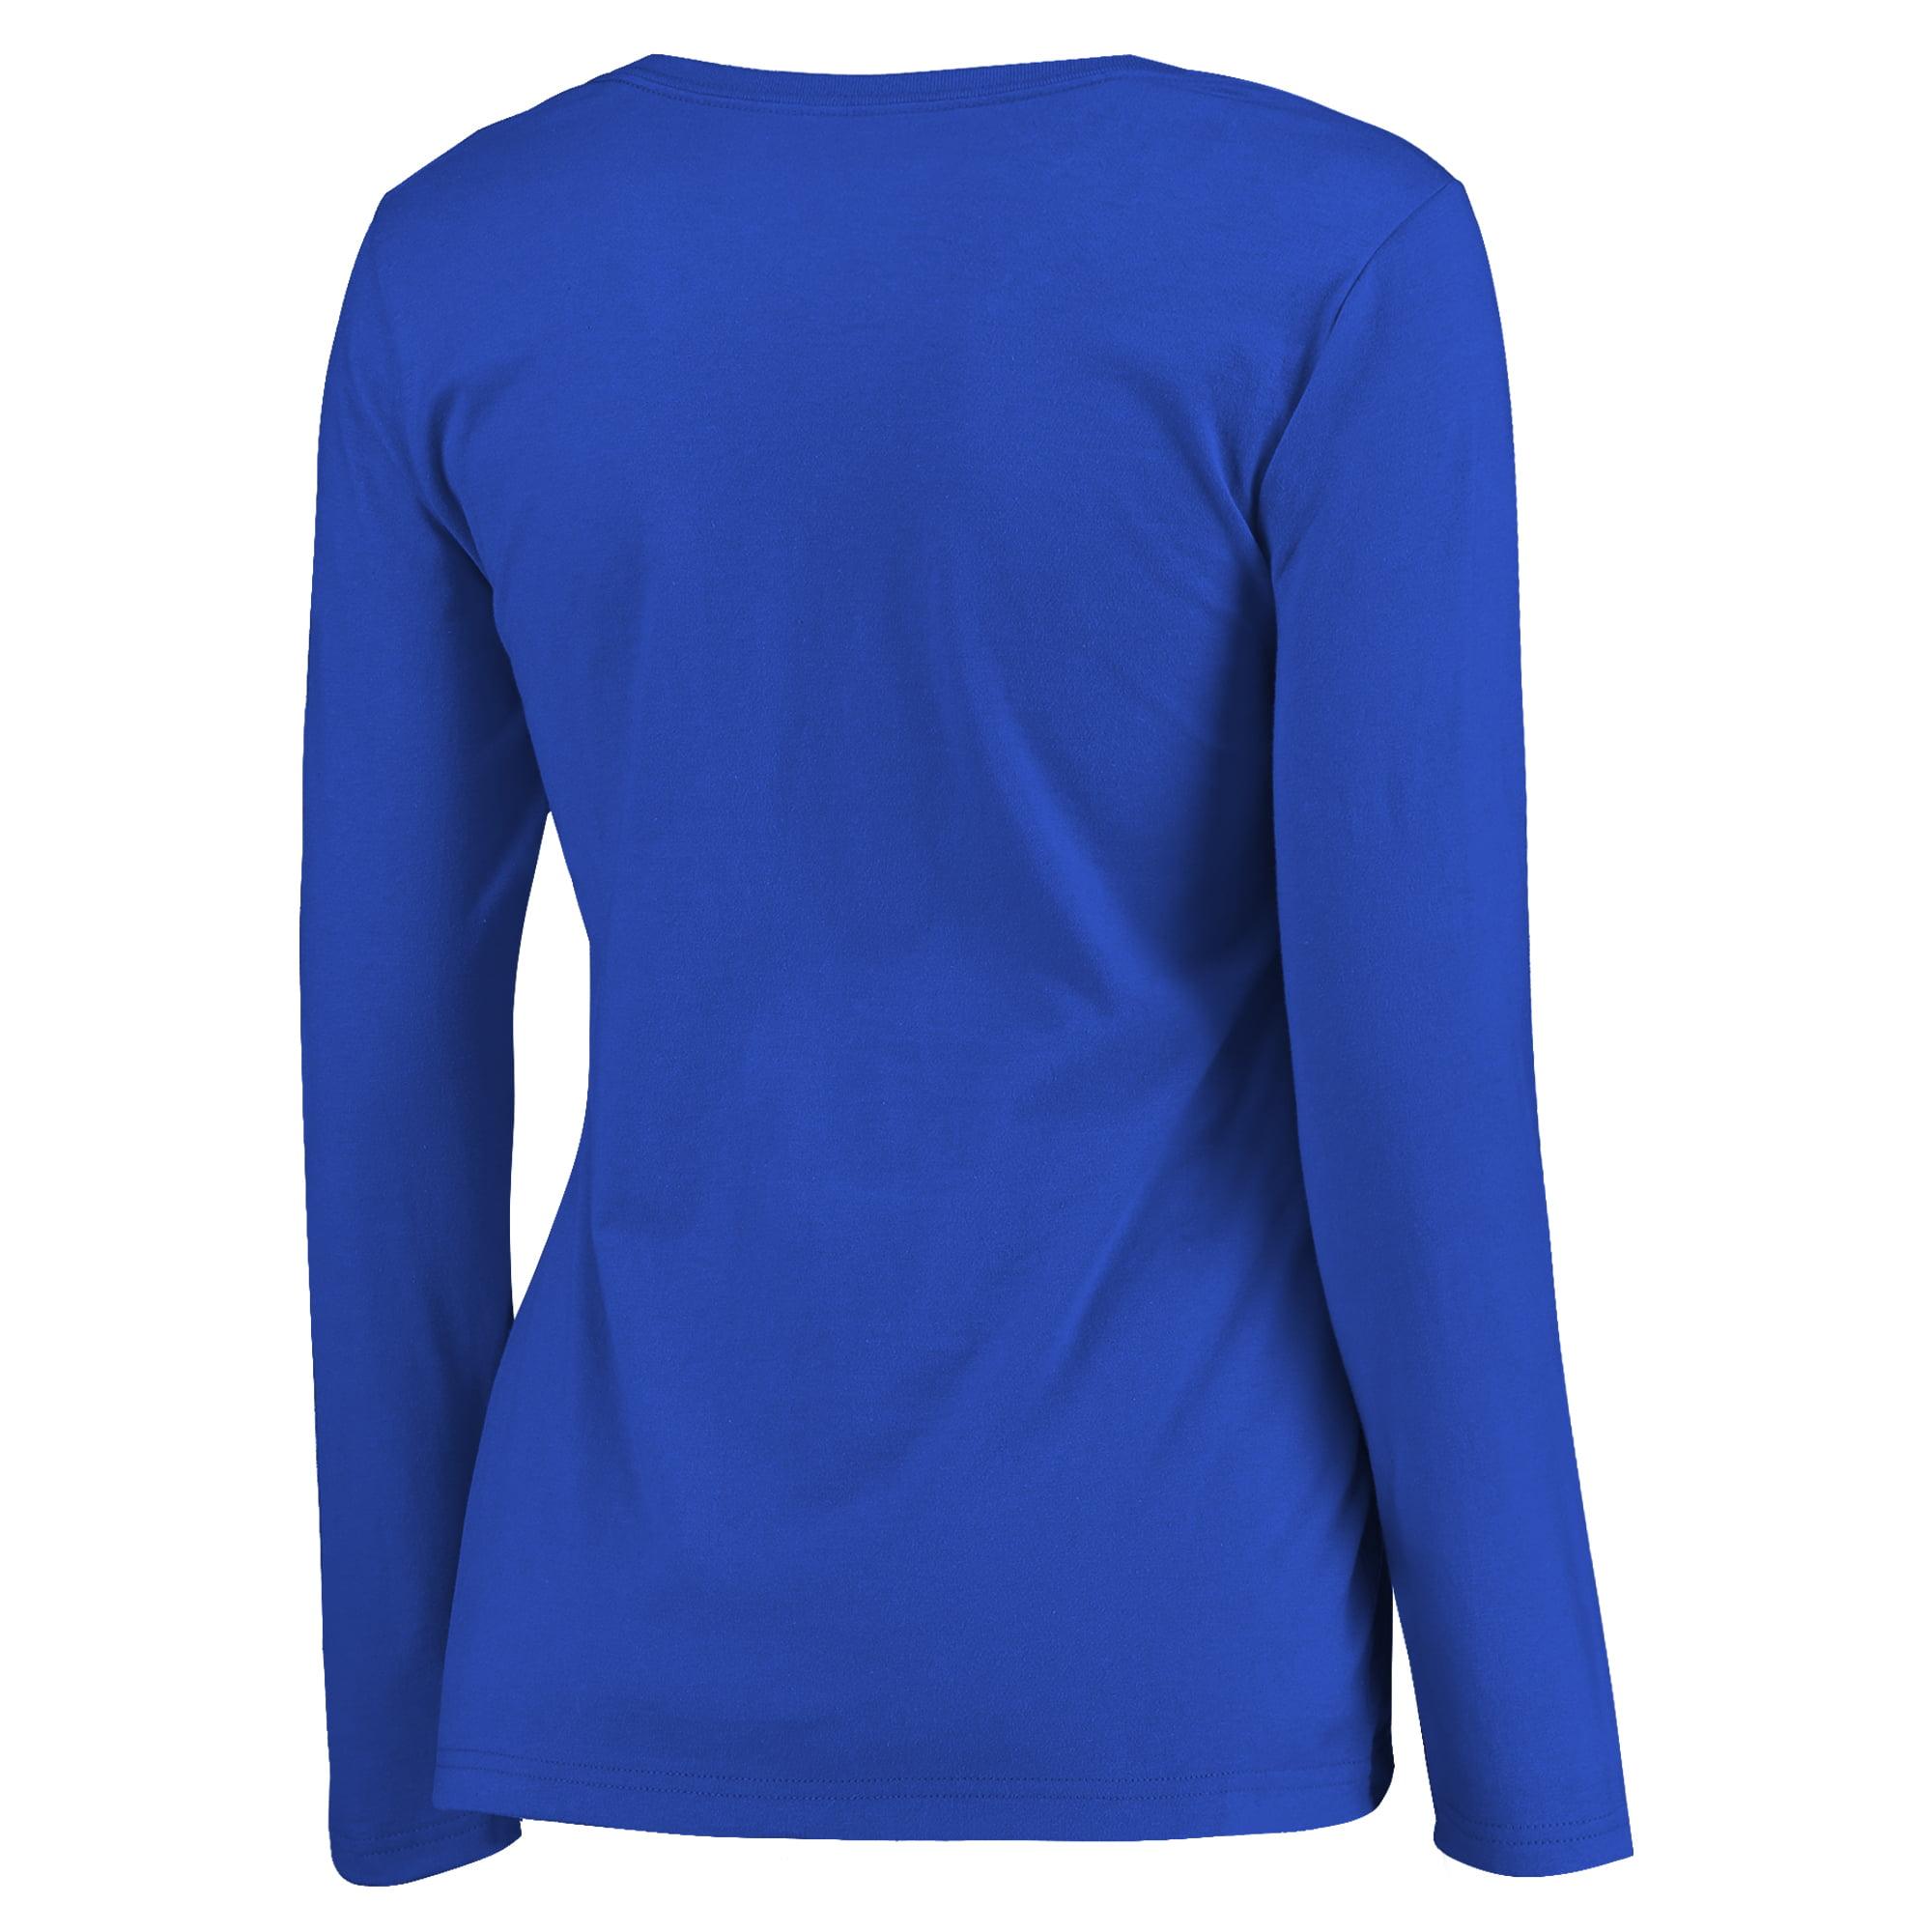 92fb9369e129 Golden State Warriors Fanatics Branded Women's 2017 NBA Finals Champions  Repeat Plus Size Long Sleeve T-Shirt - Royal - Walmart.com